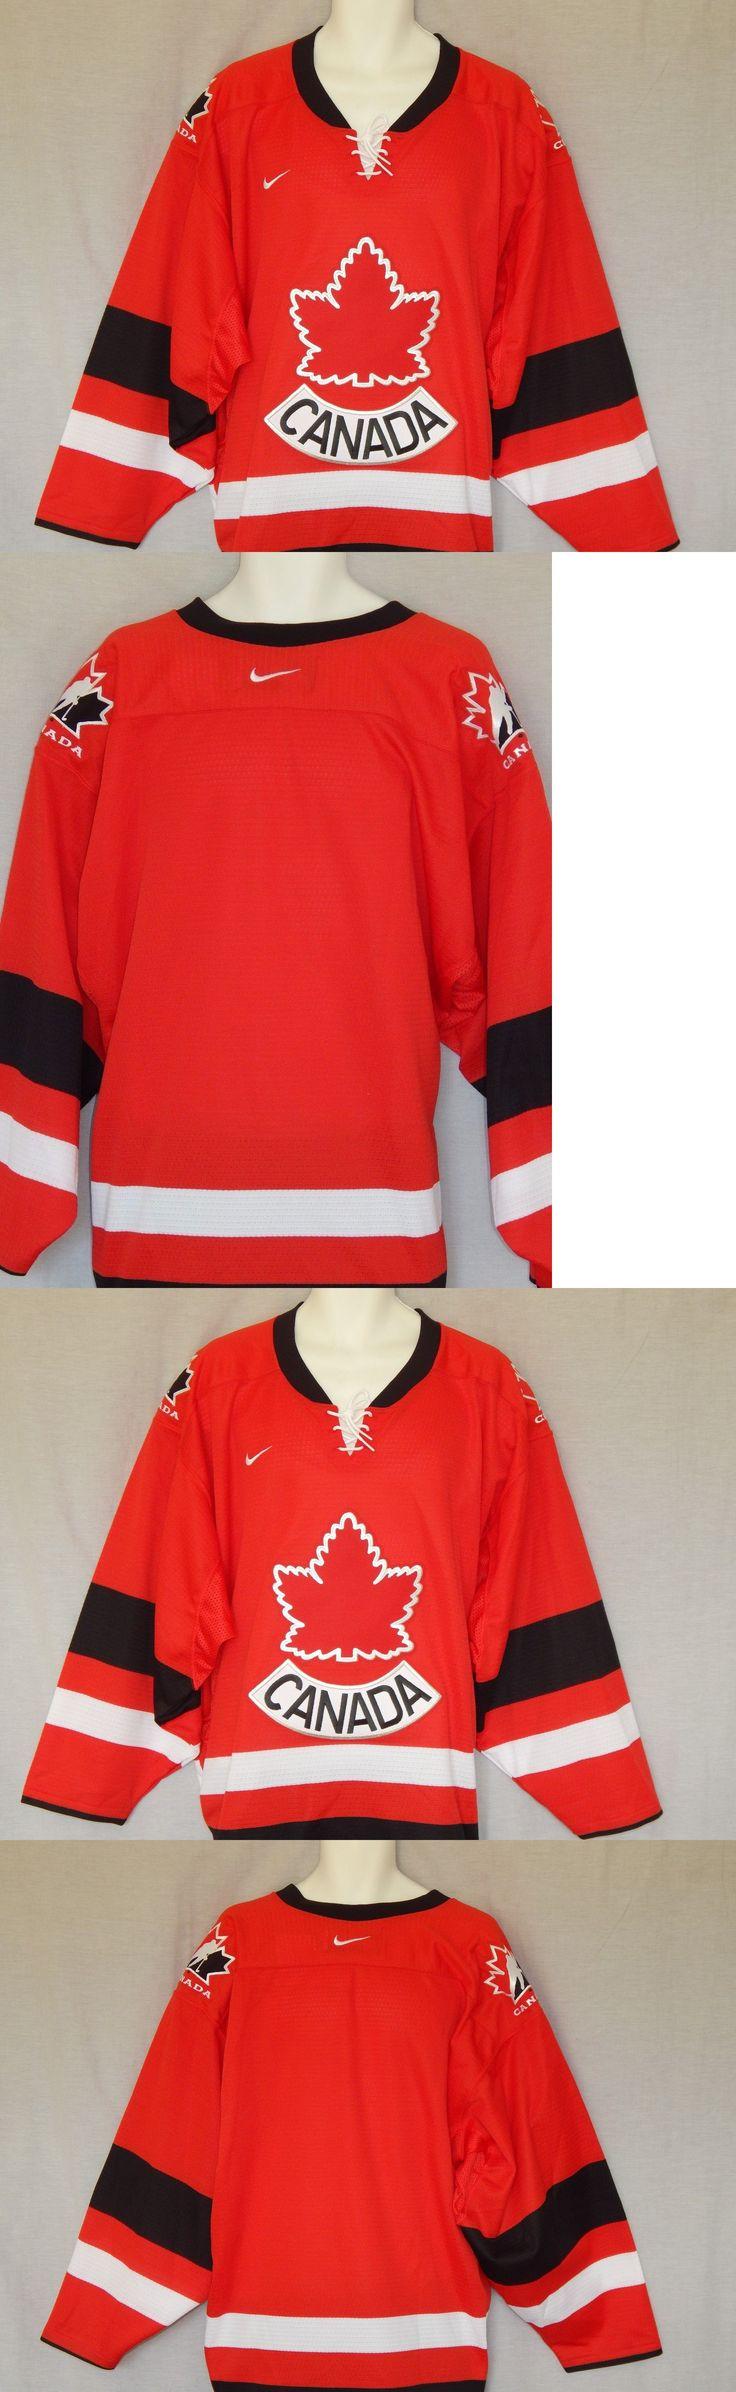 Hockey-Team Canada 2868: Team Canada Hockey Jersey Nike Vintage Red Mens Size Xl Olympics -> BUY IT NOW ONLY: $105.99 on eBay!